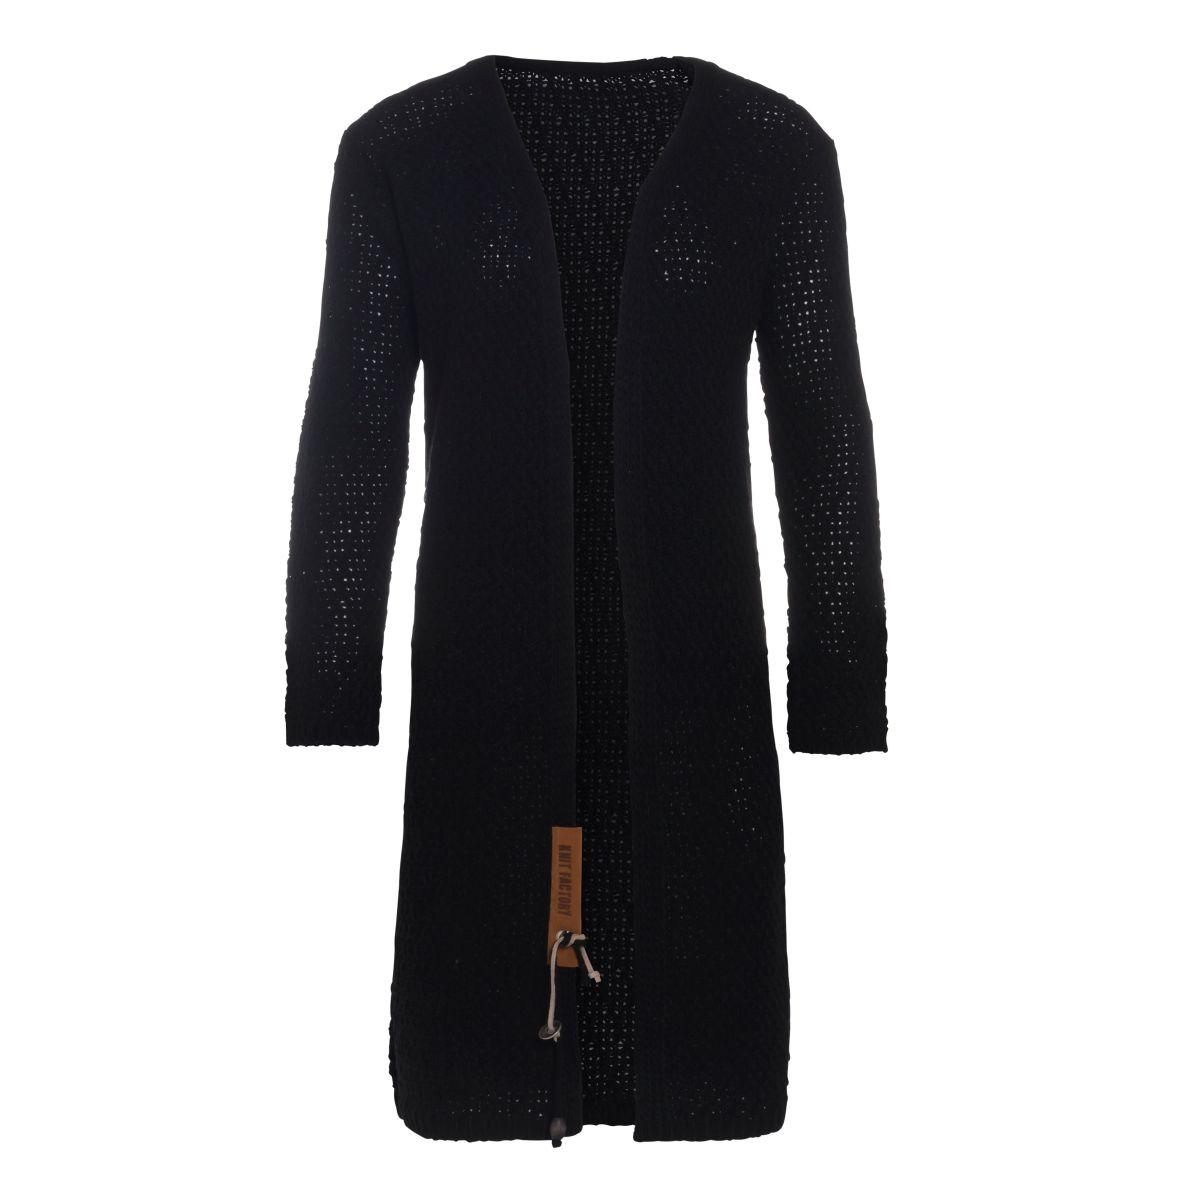 luna long knitted cardigan black 4648